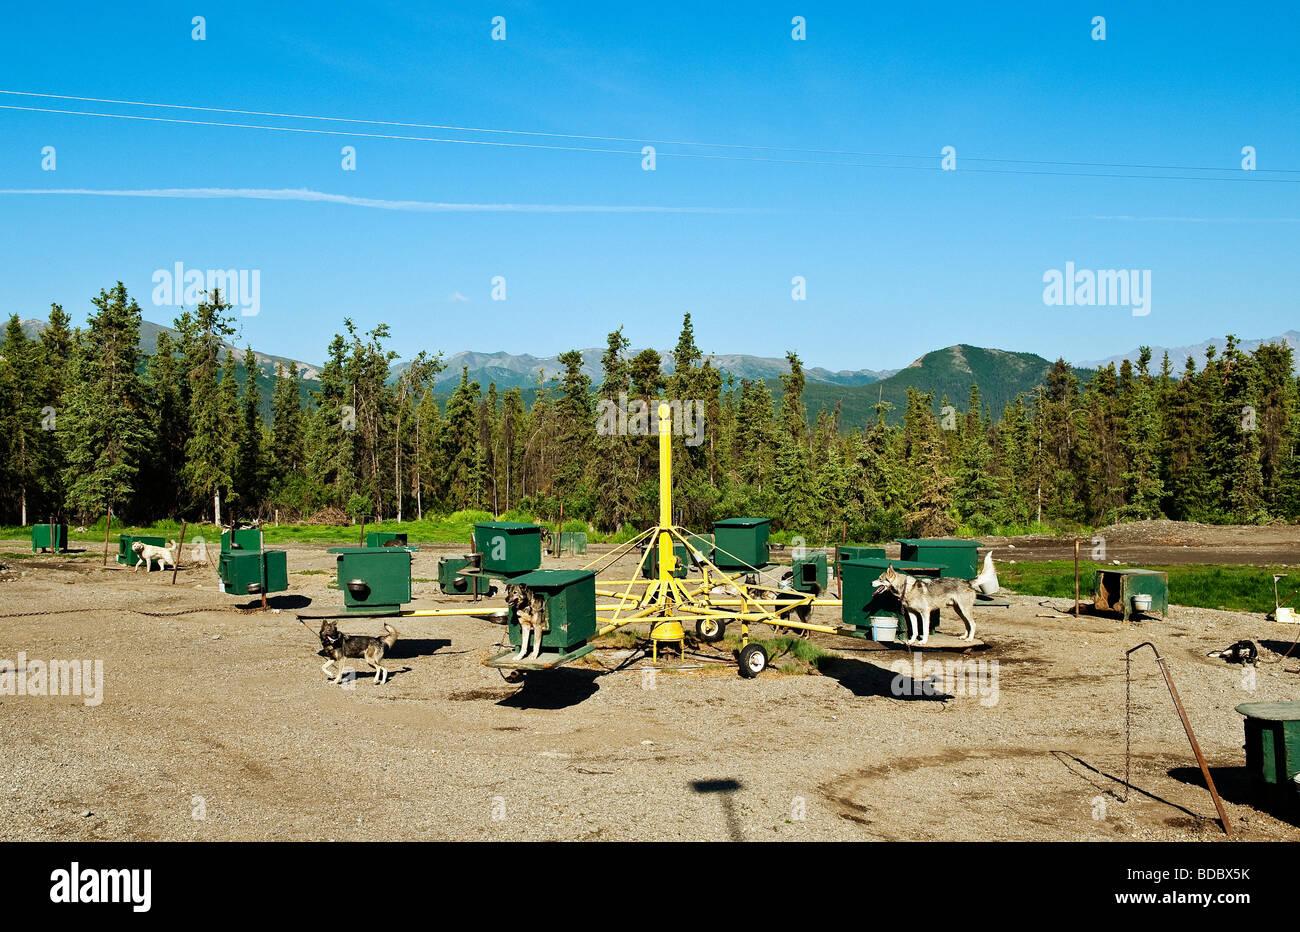 Jeff King's Husky Homestead Kennel Denali Alaska - Stock Image